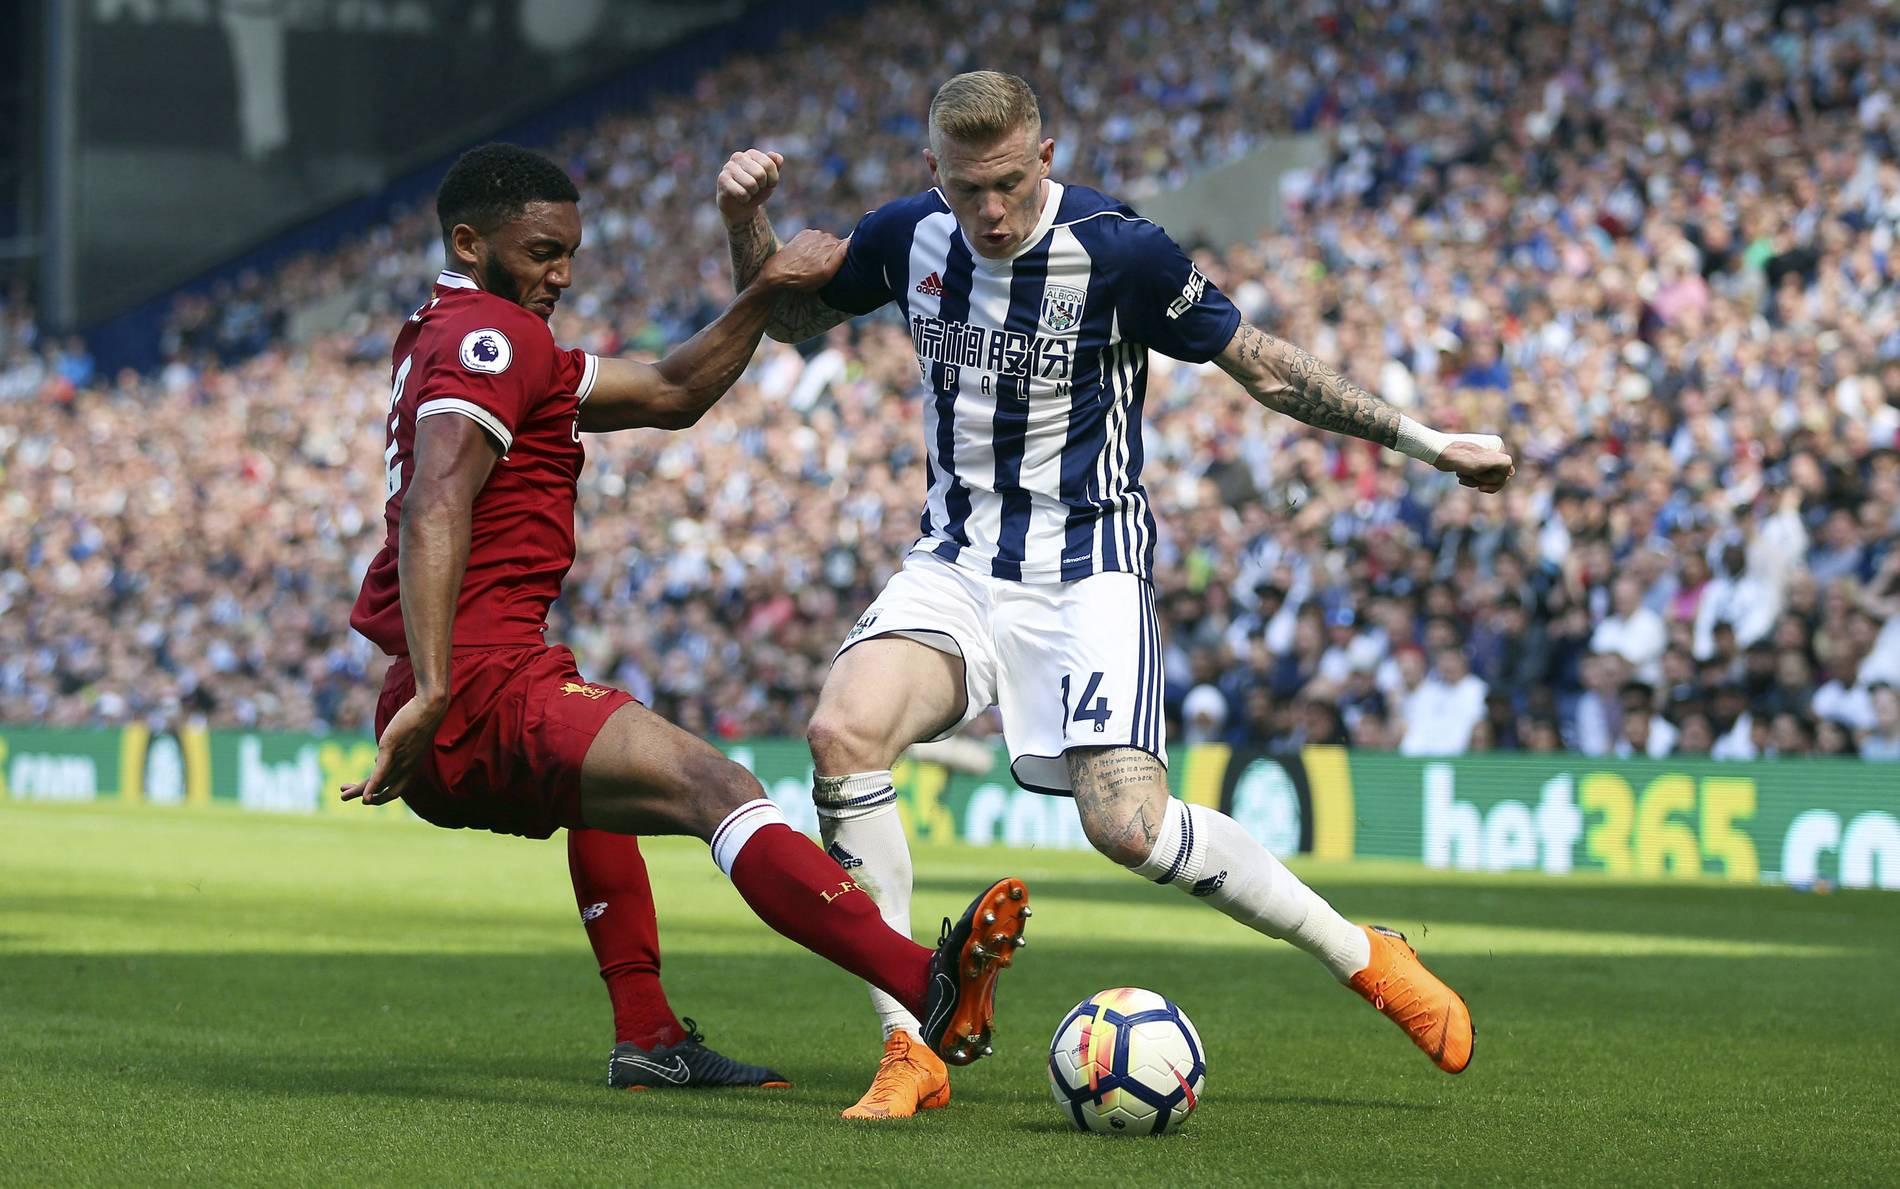 Fussball Liverpool Verteidiger Joe Gomez Verletzt